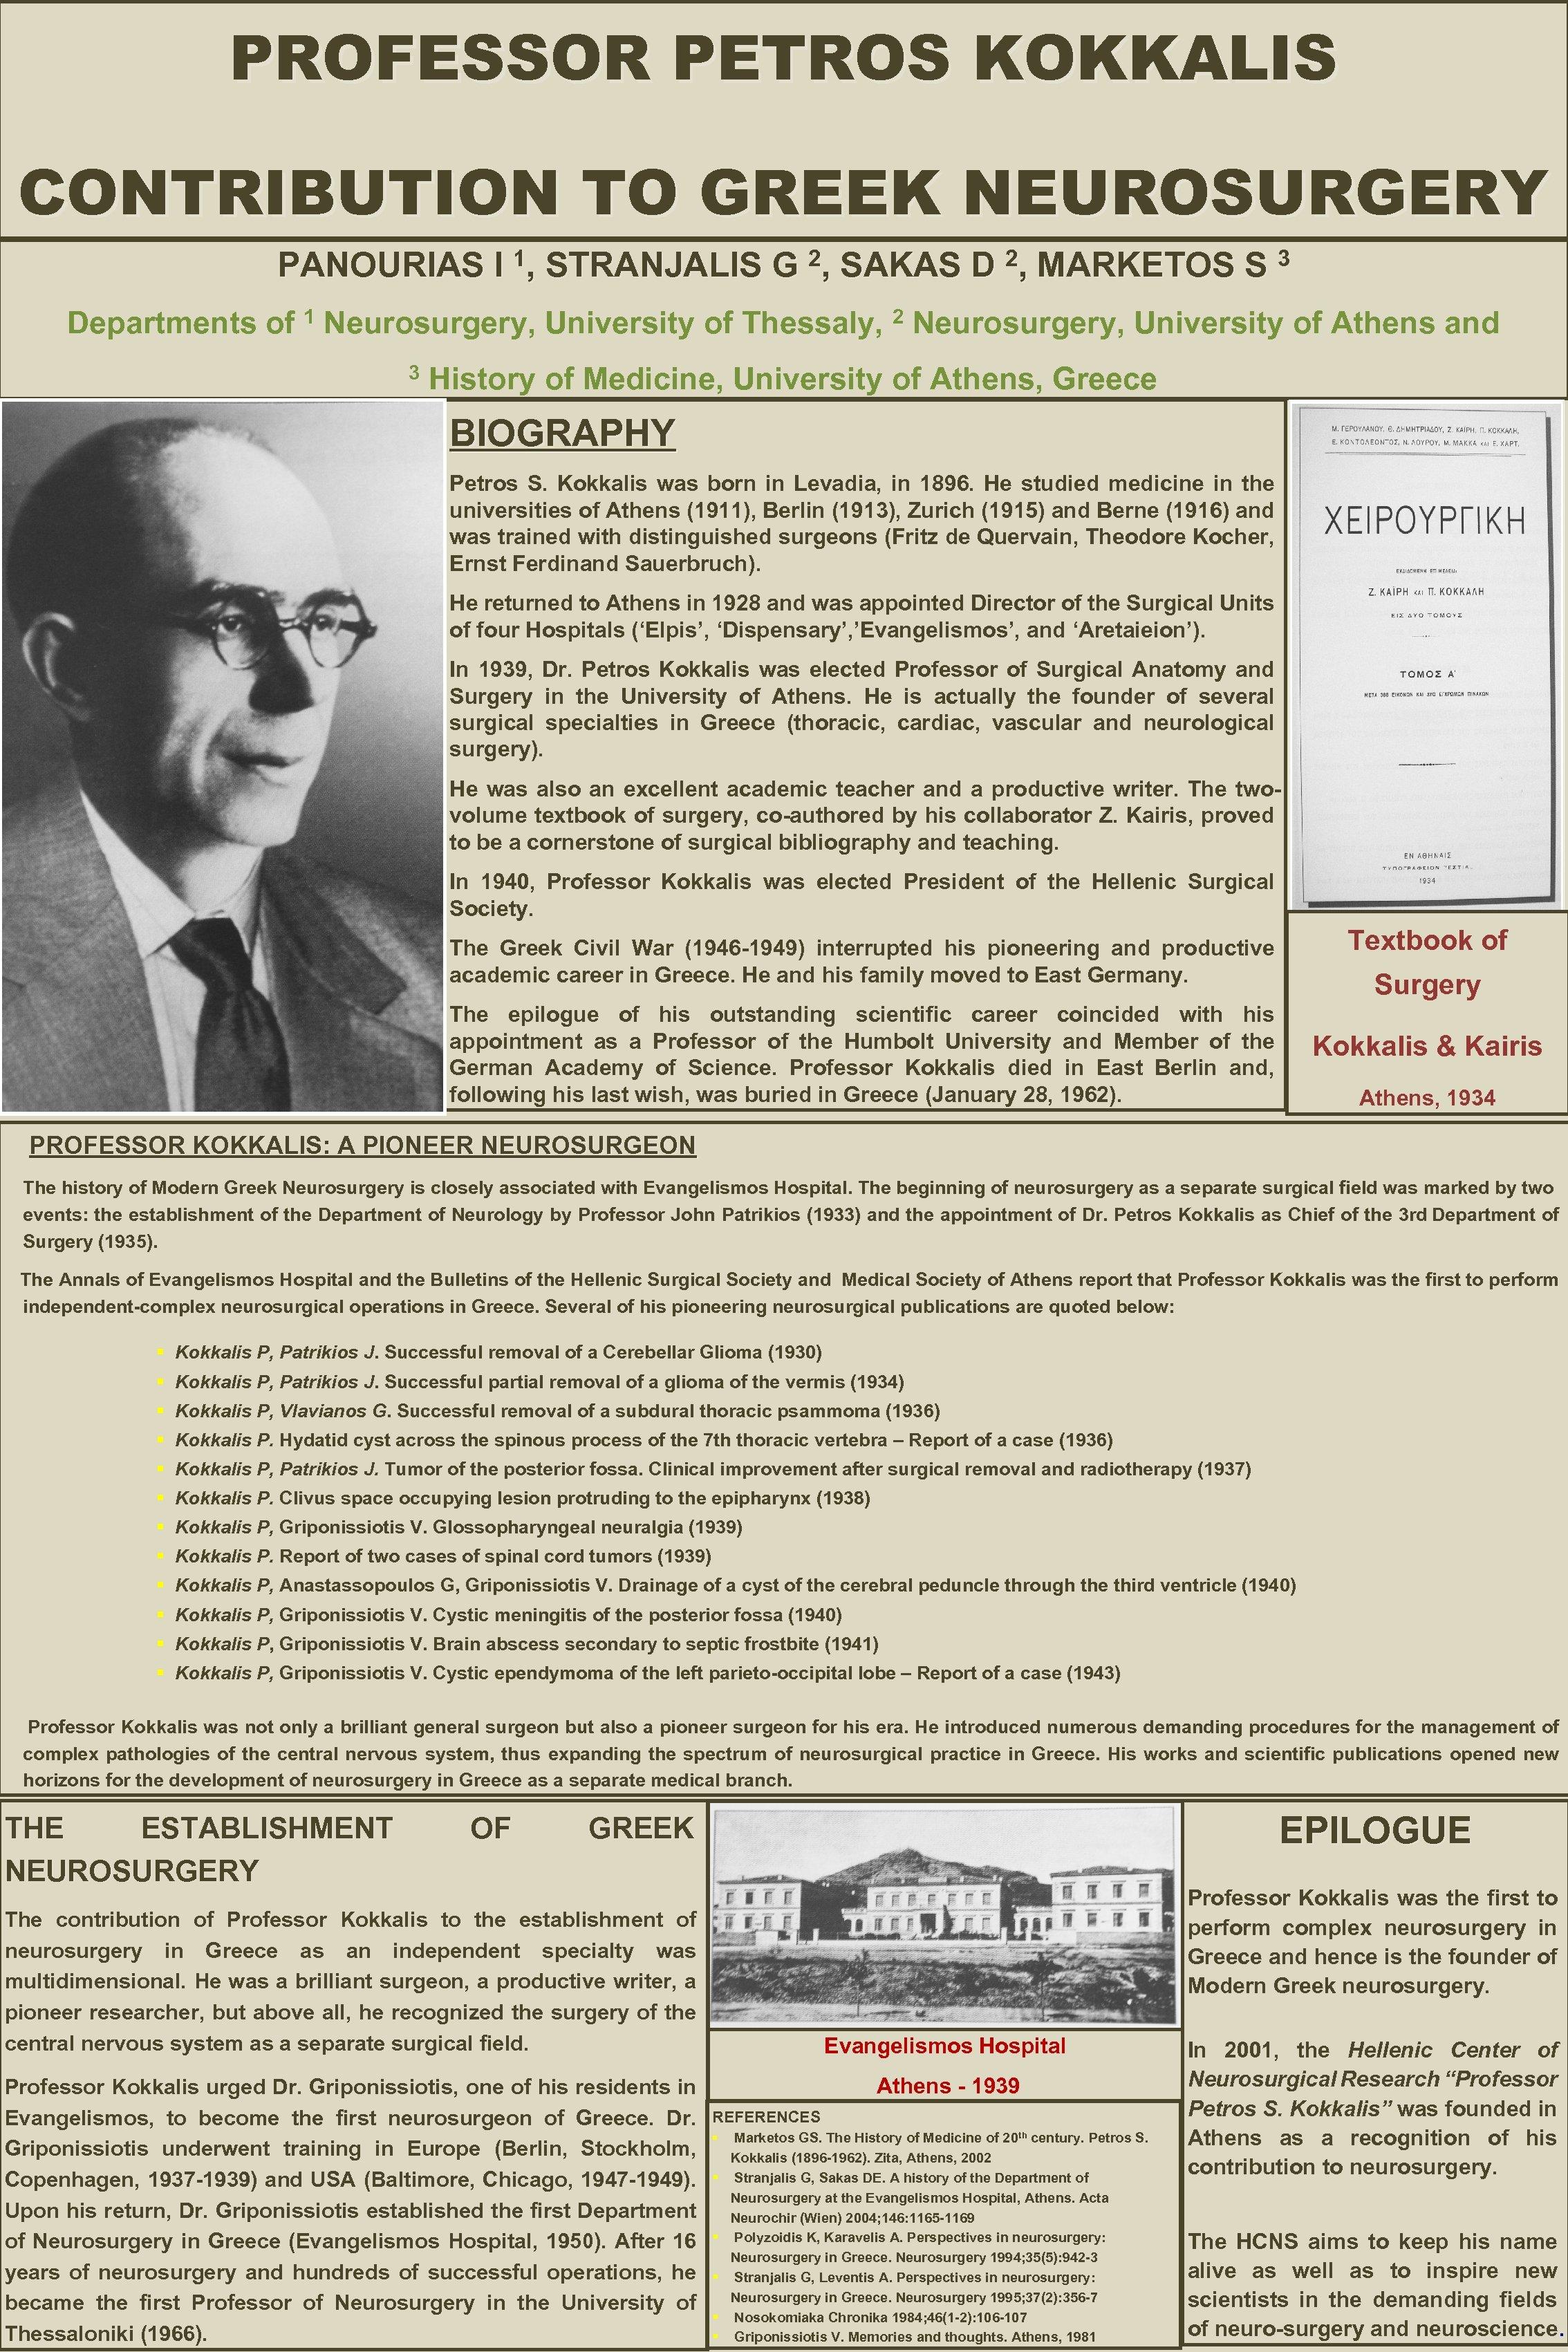 PROFESSOR PETROS KOKKALIS CONTRIBUTION TO GREEK NEUROSURGERY PANOURIAS I 1, STRANJALIS G 2, SAKAS